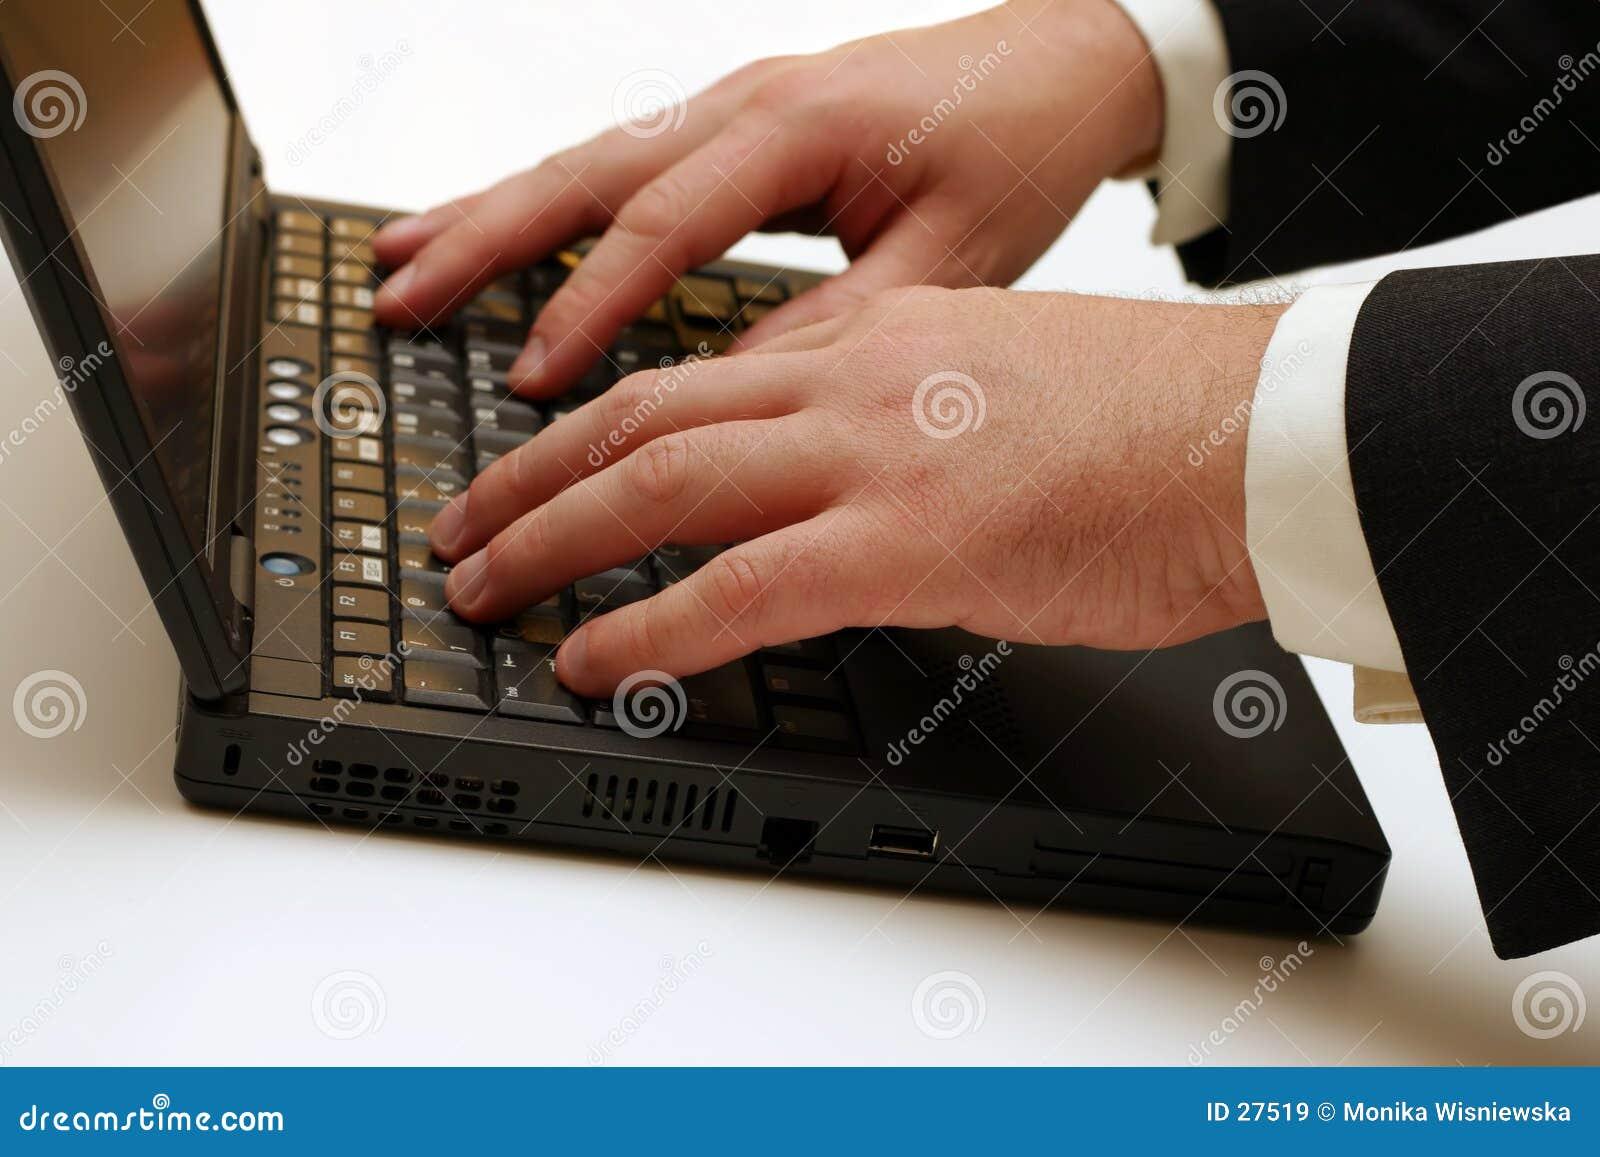 Portátil - datilografando